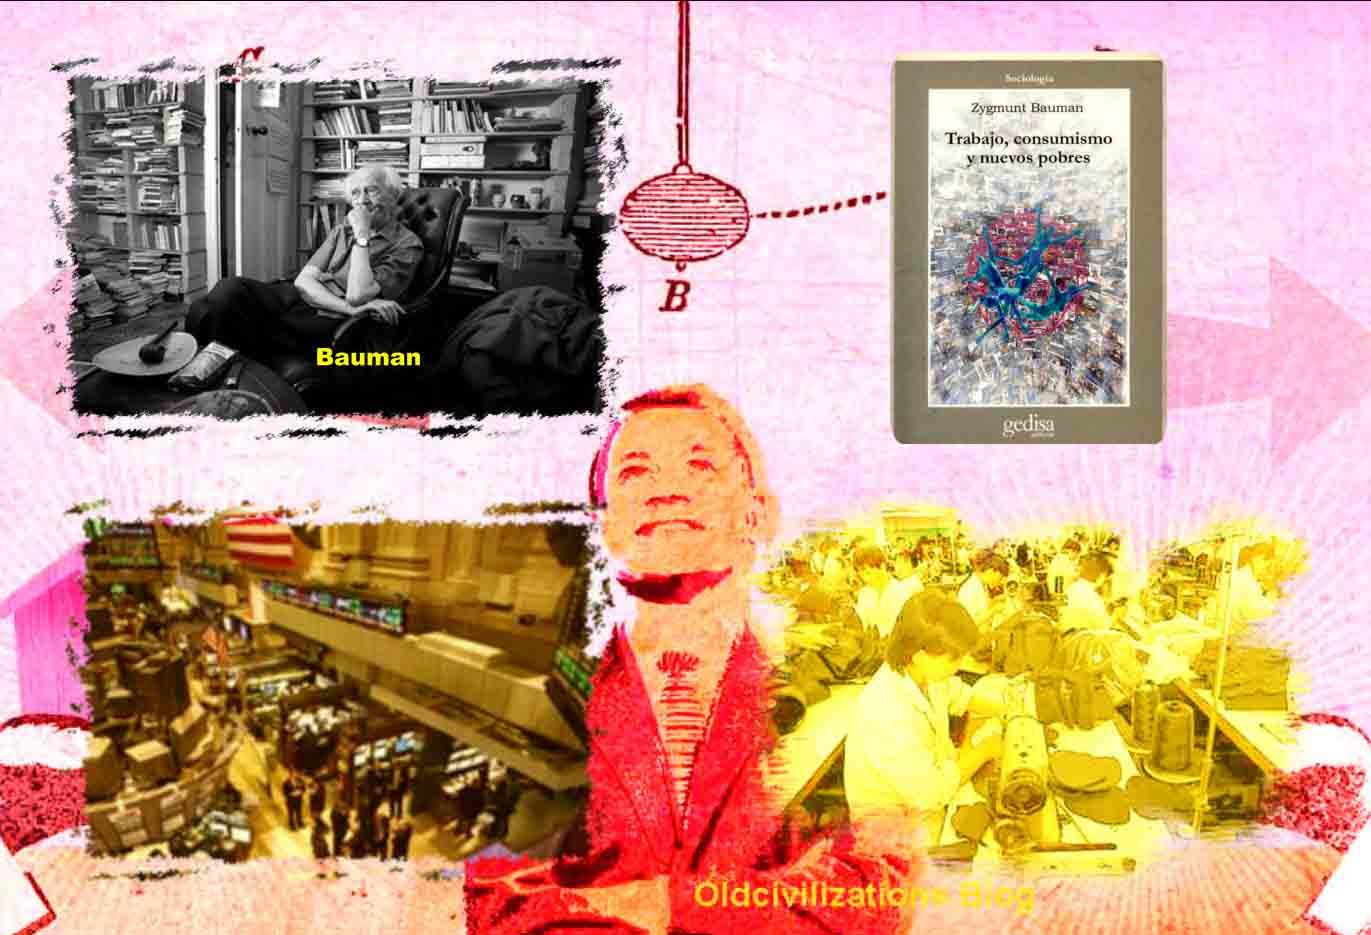 http://oldcivilizations.files.wordpress.com/2013/11/imagen-21.jpg